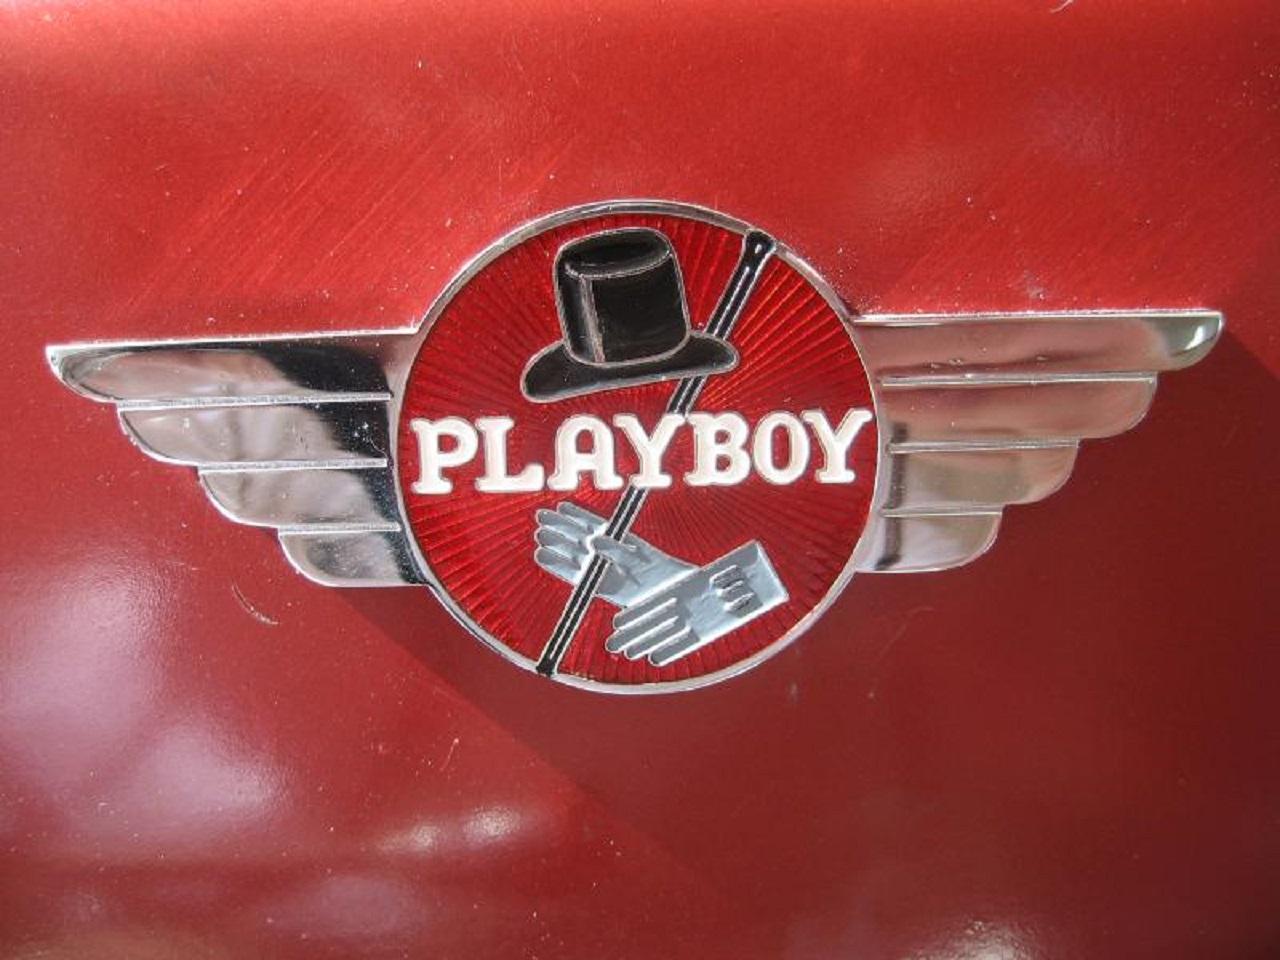 Playboy Car For Sale